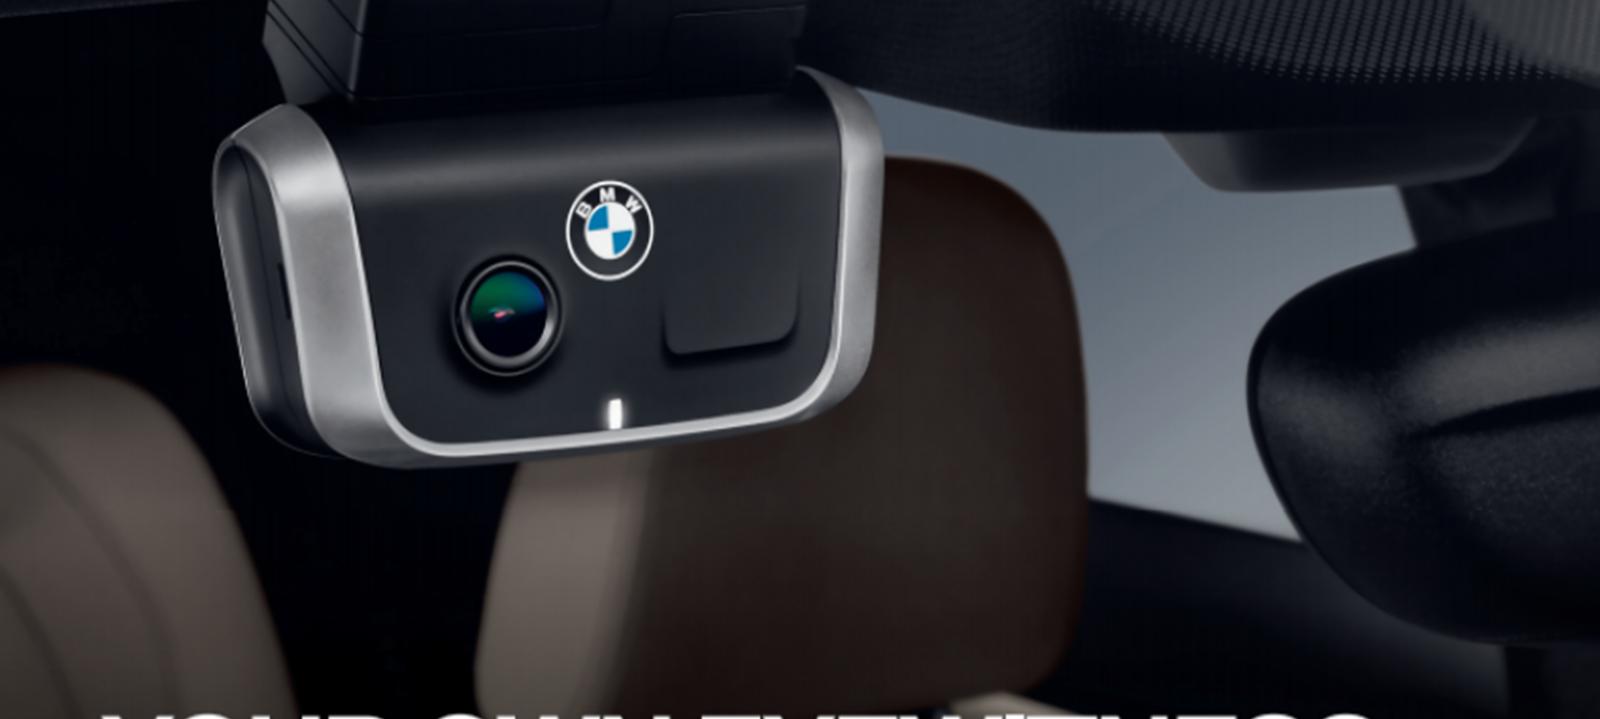 bmw advanced car eye 2 0 475 fitted. Black Bedroom Furniture Sets. Home Design Ideas